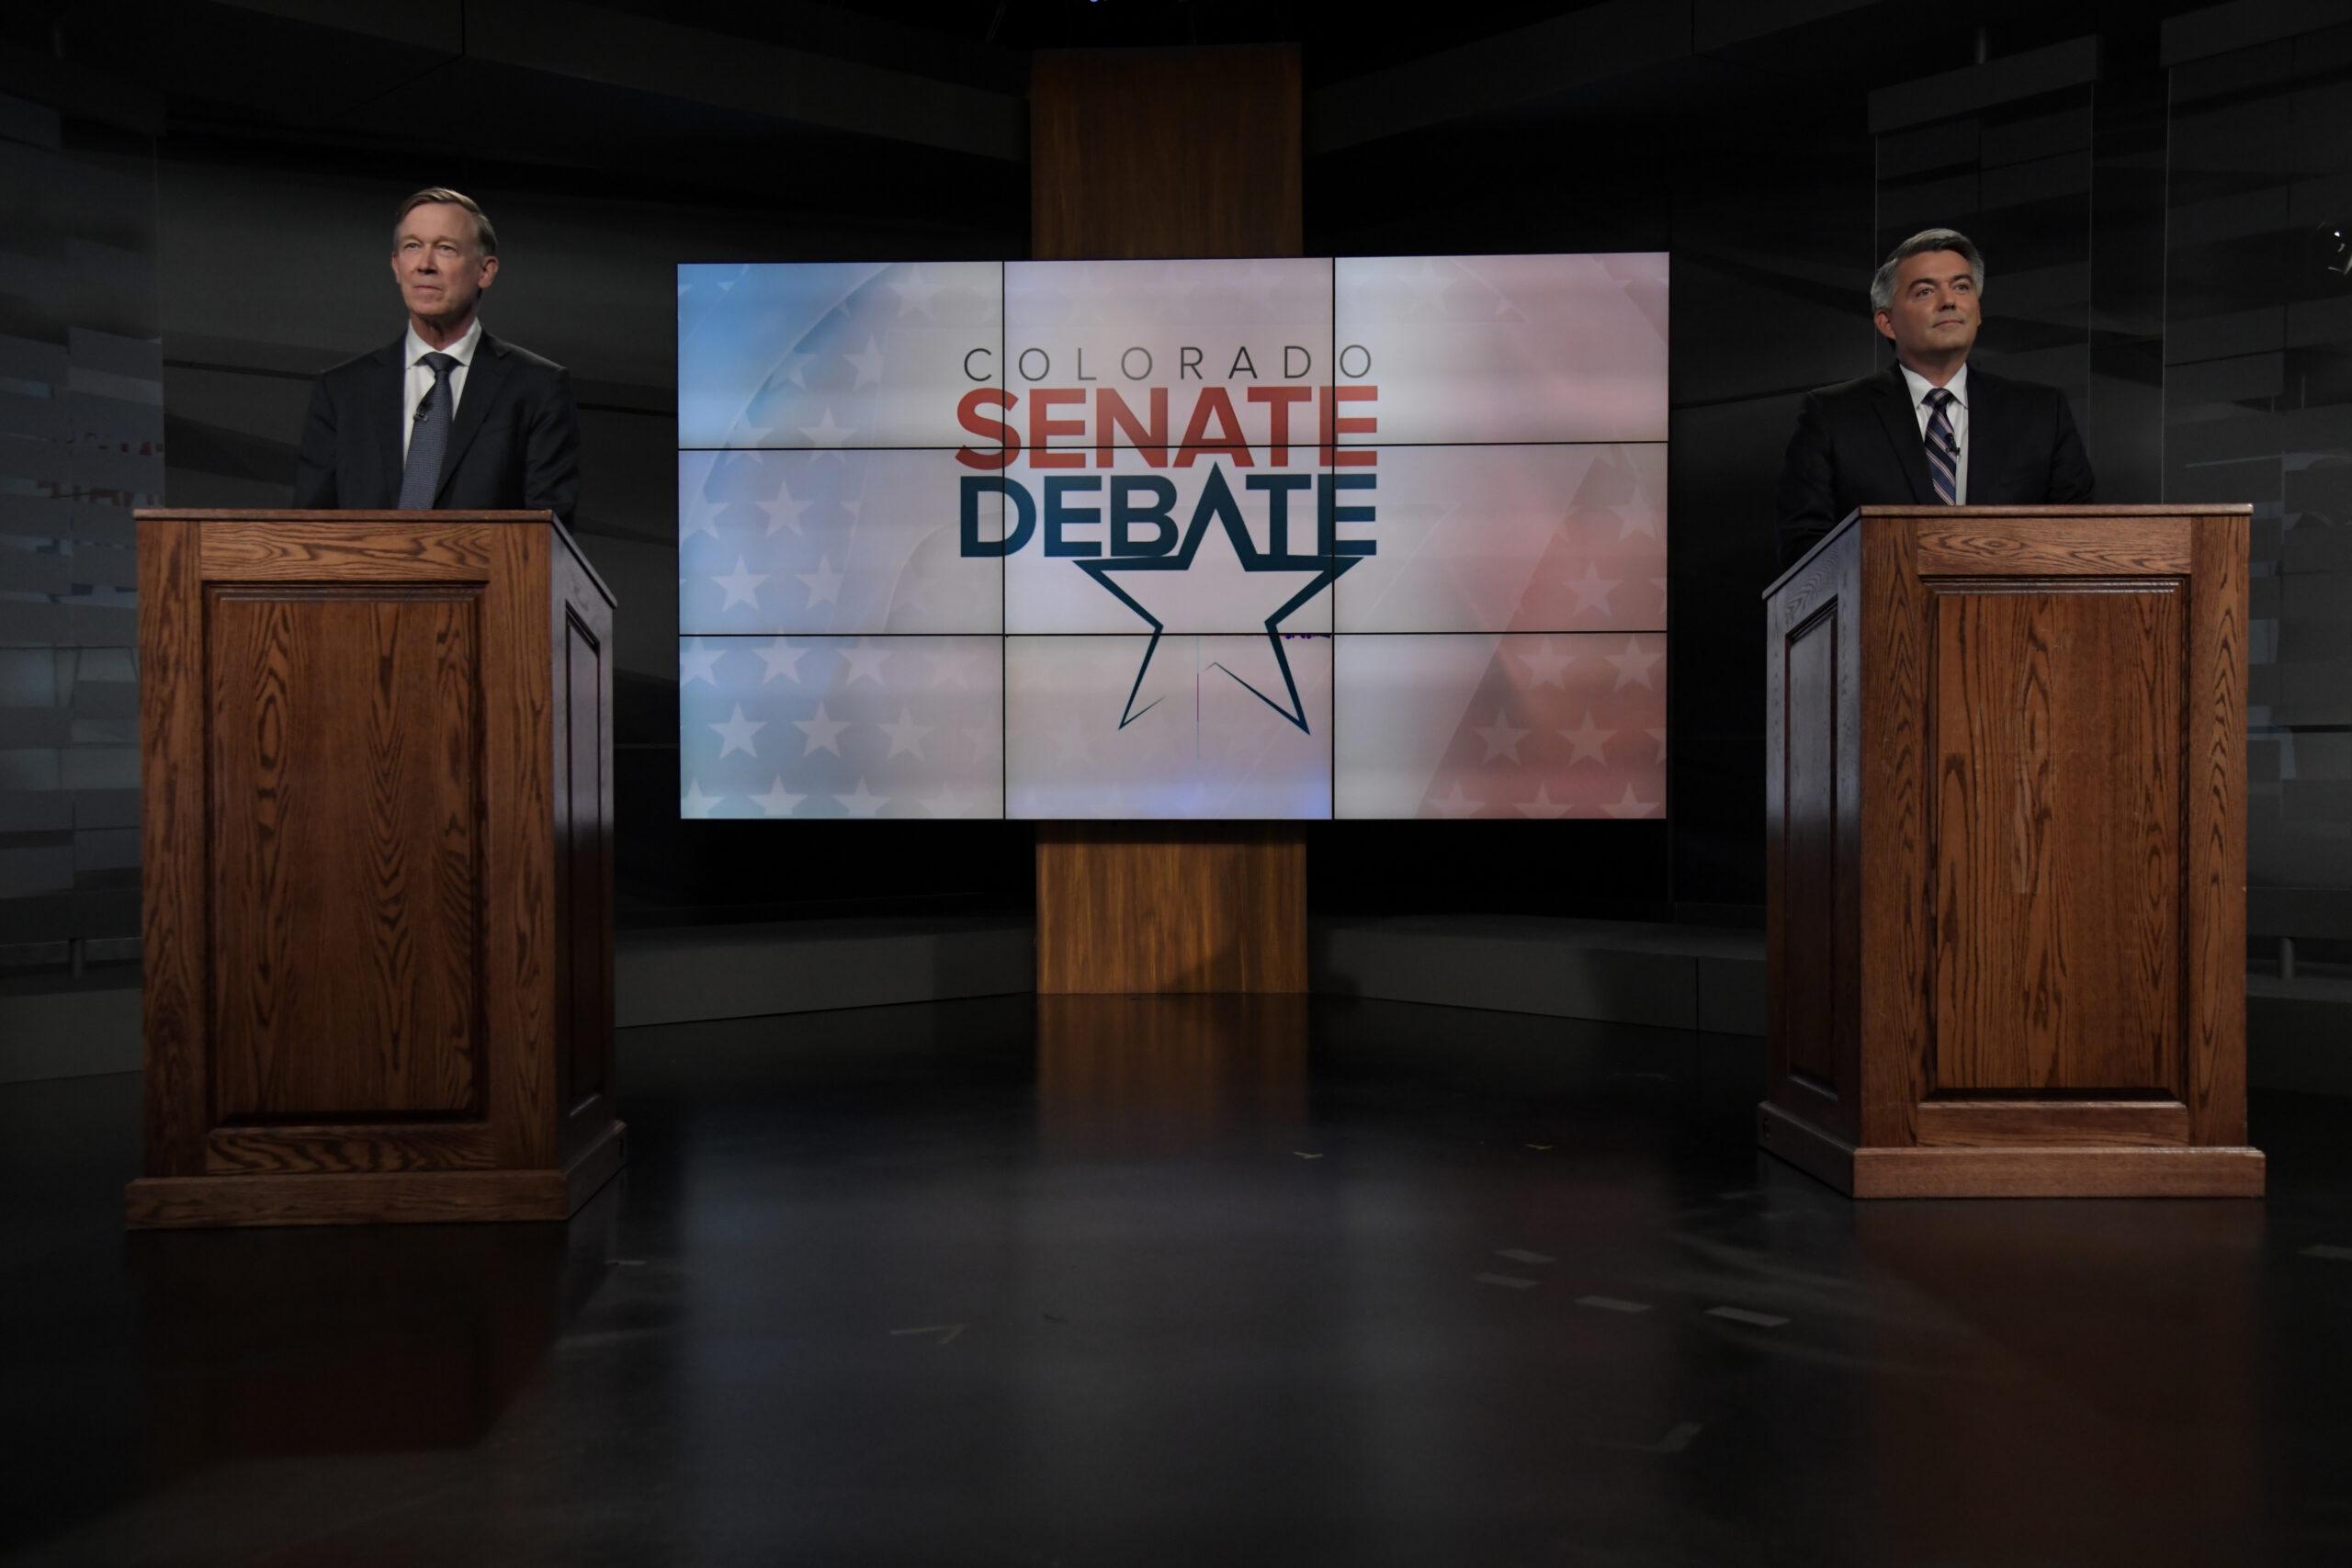 Colorado Senate debate